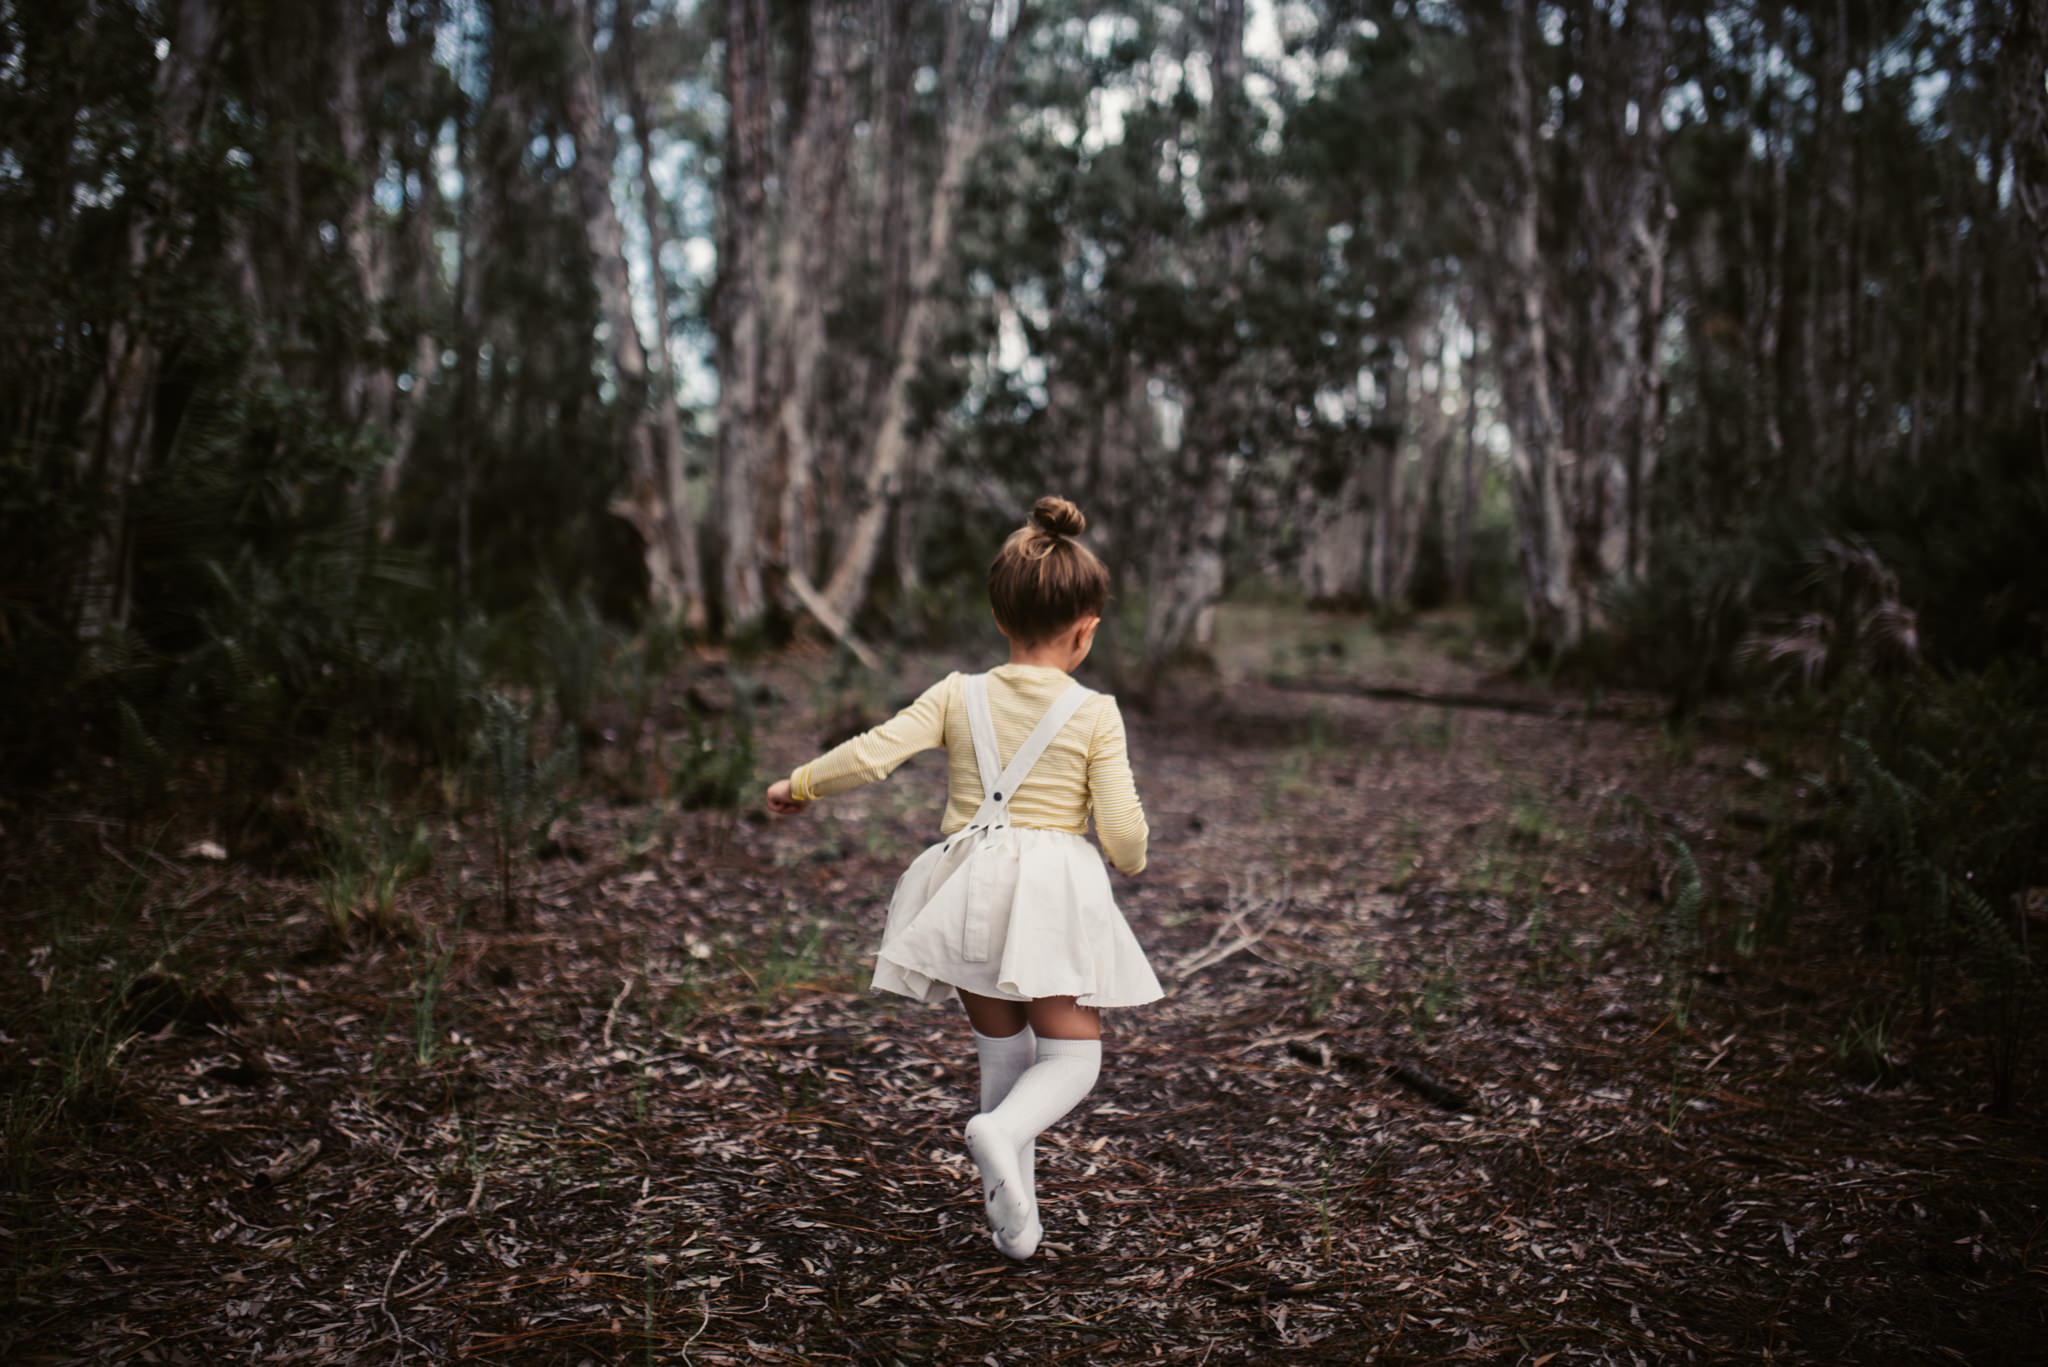 twyla jones photography - treasure coast florida - childrens adventure clothing commercial shoot-.jpg